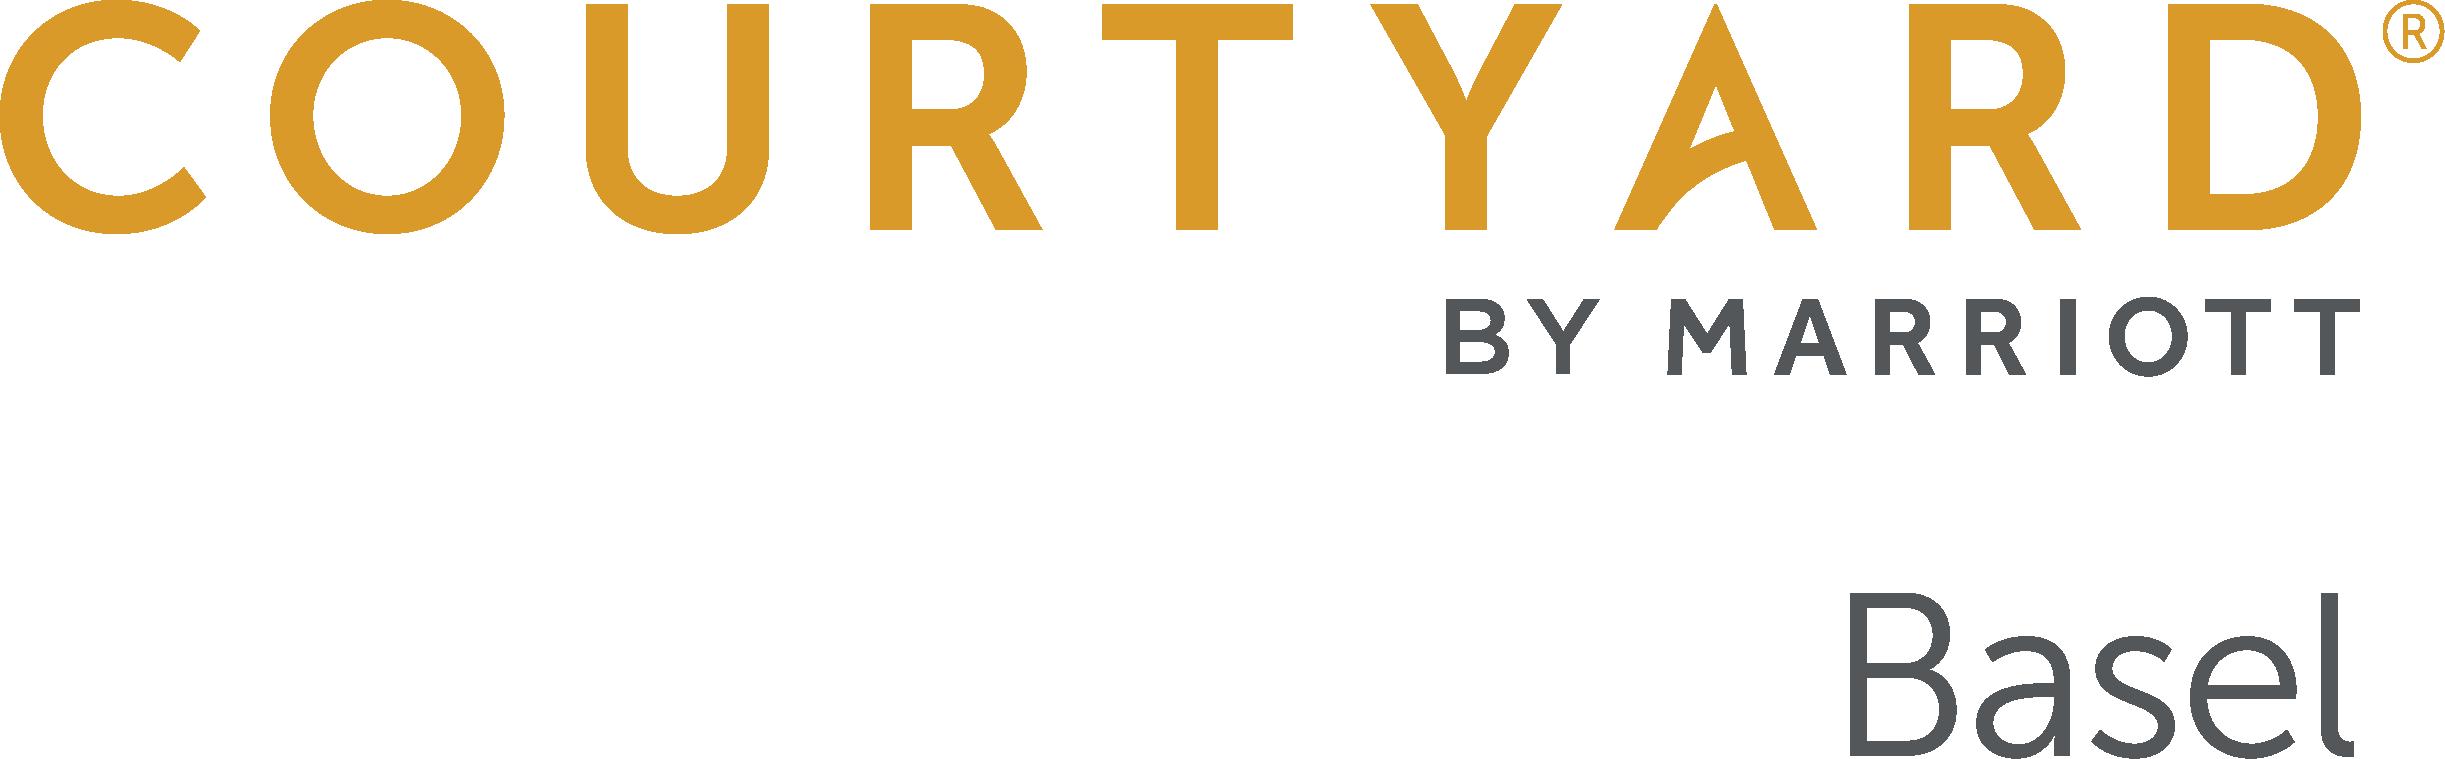 BSLCY_Primary_RGB